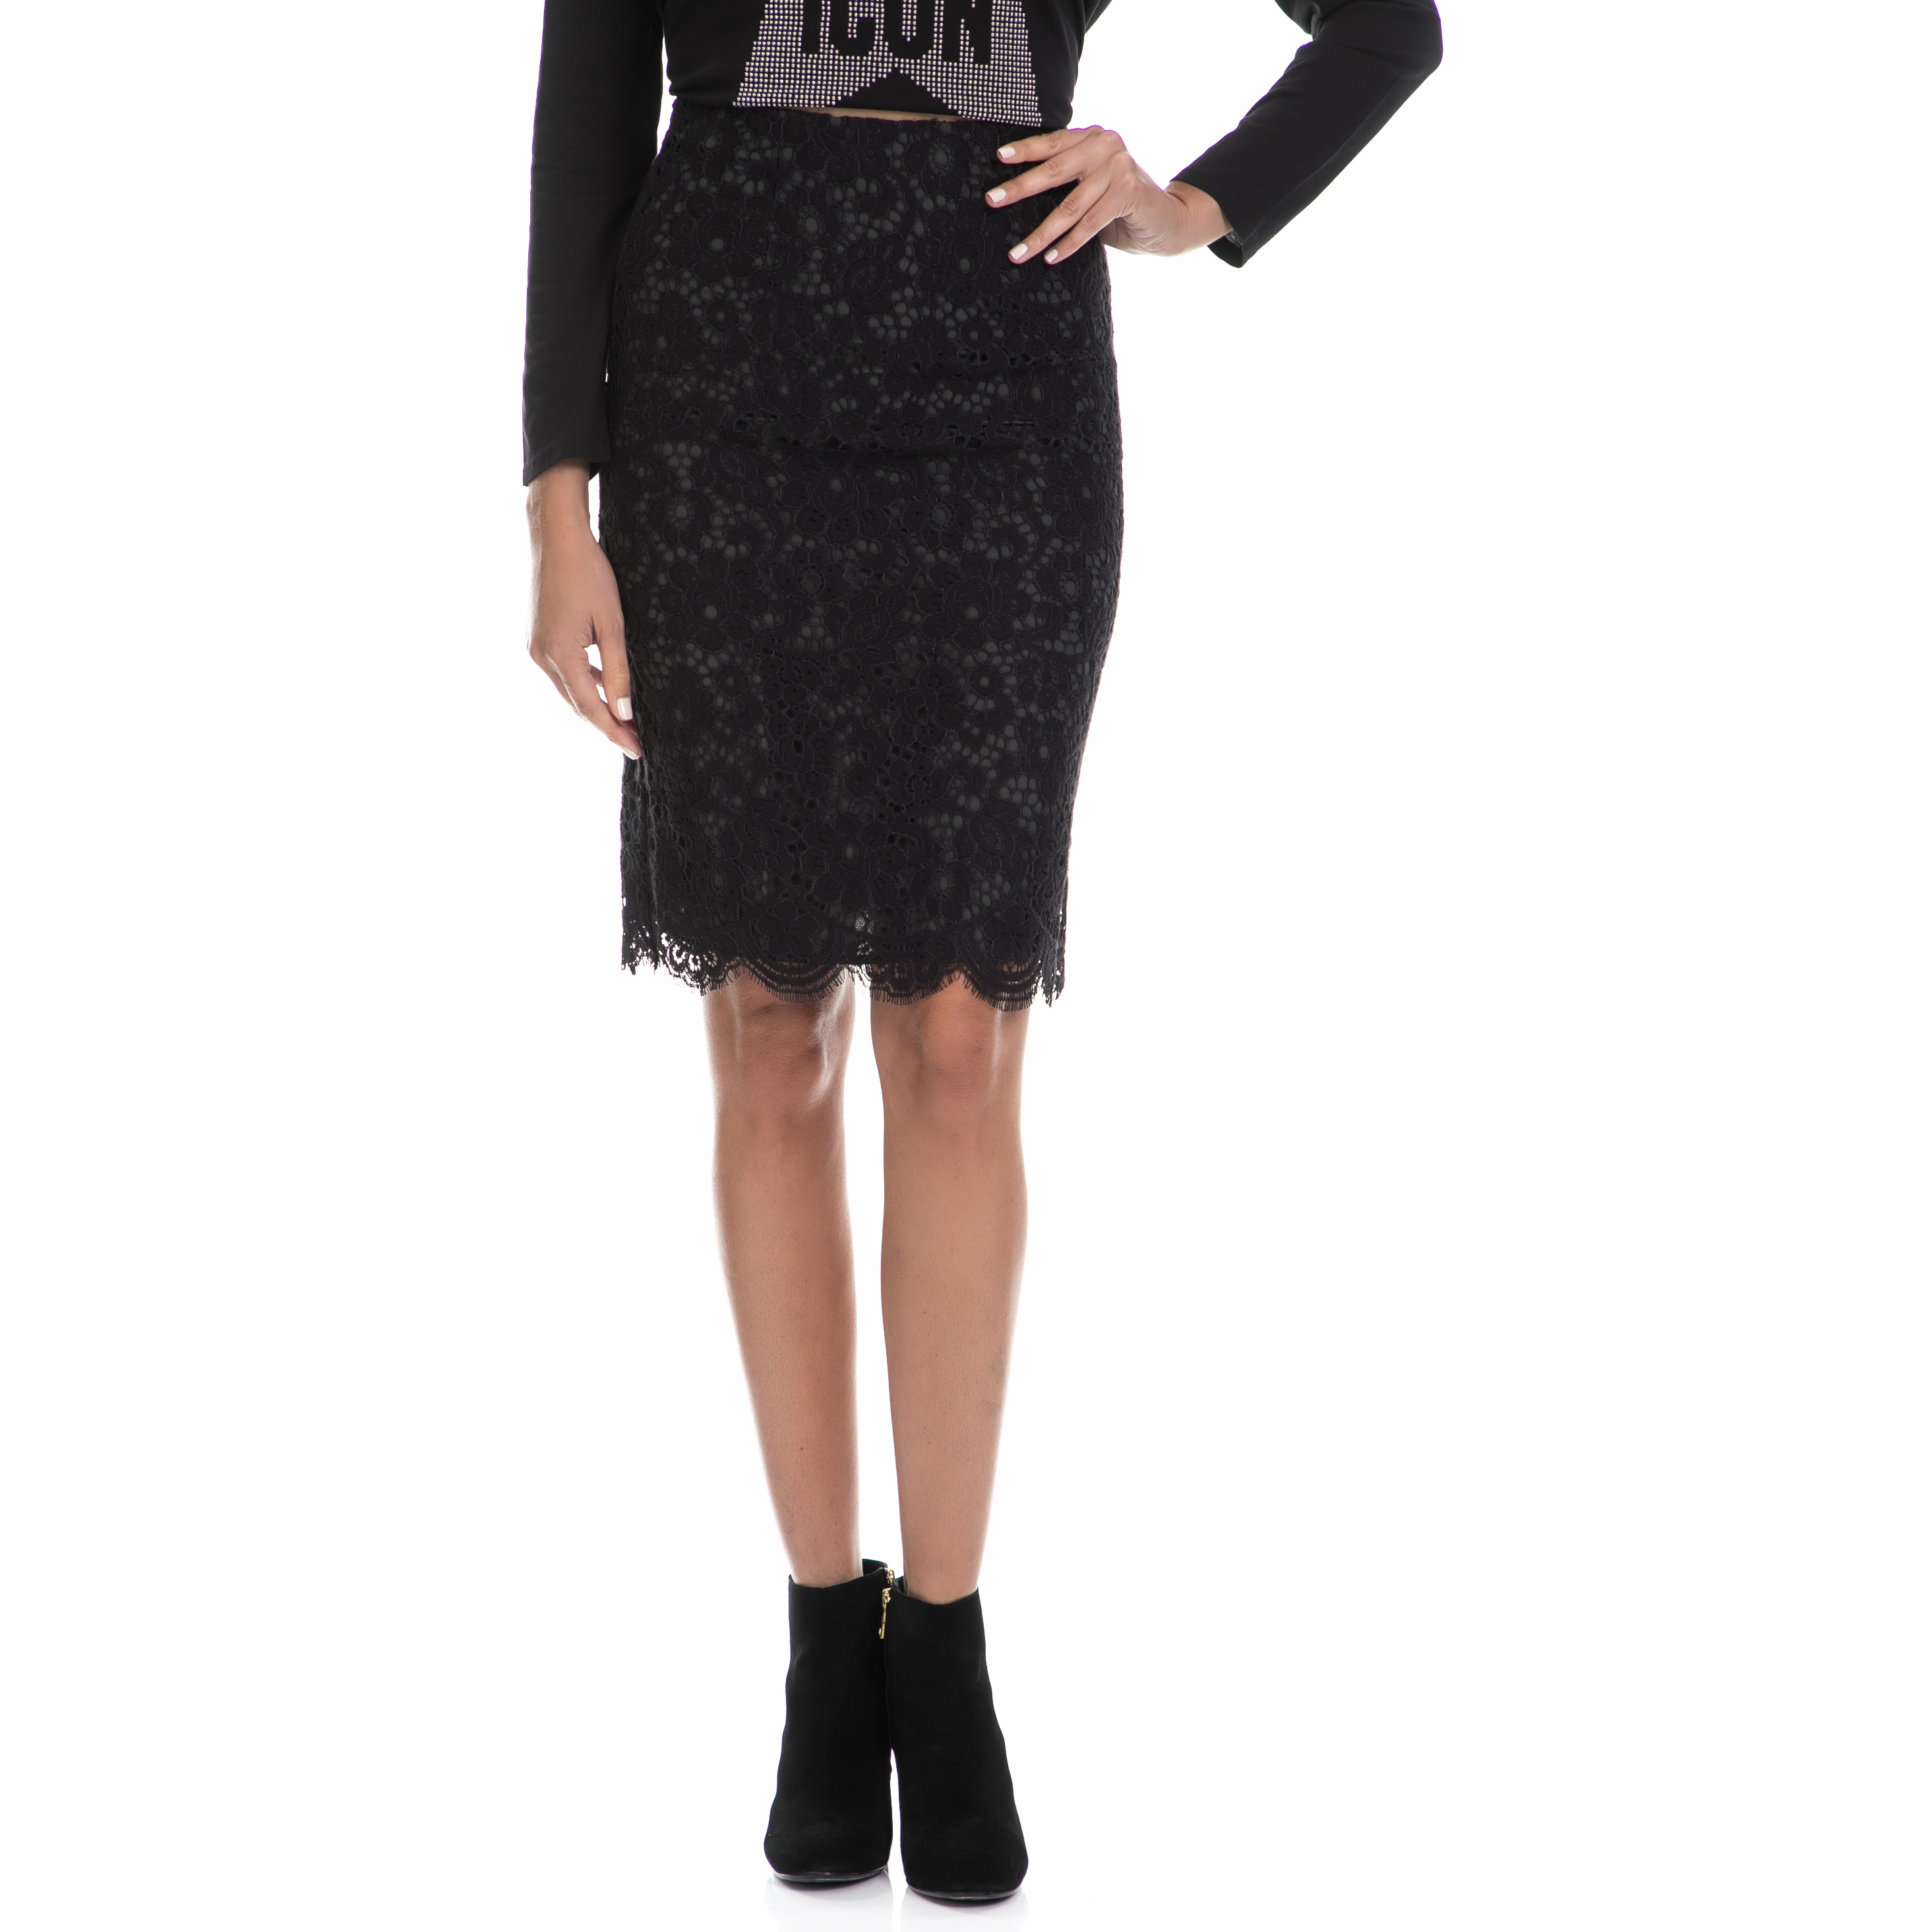 JUICY COUTURE - Γυναικεία midi φούστα JUICY COUTURE BUCHAREST μαύρη